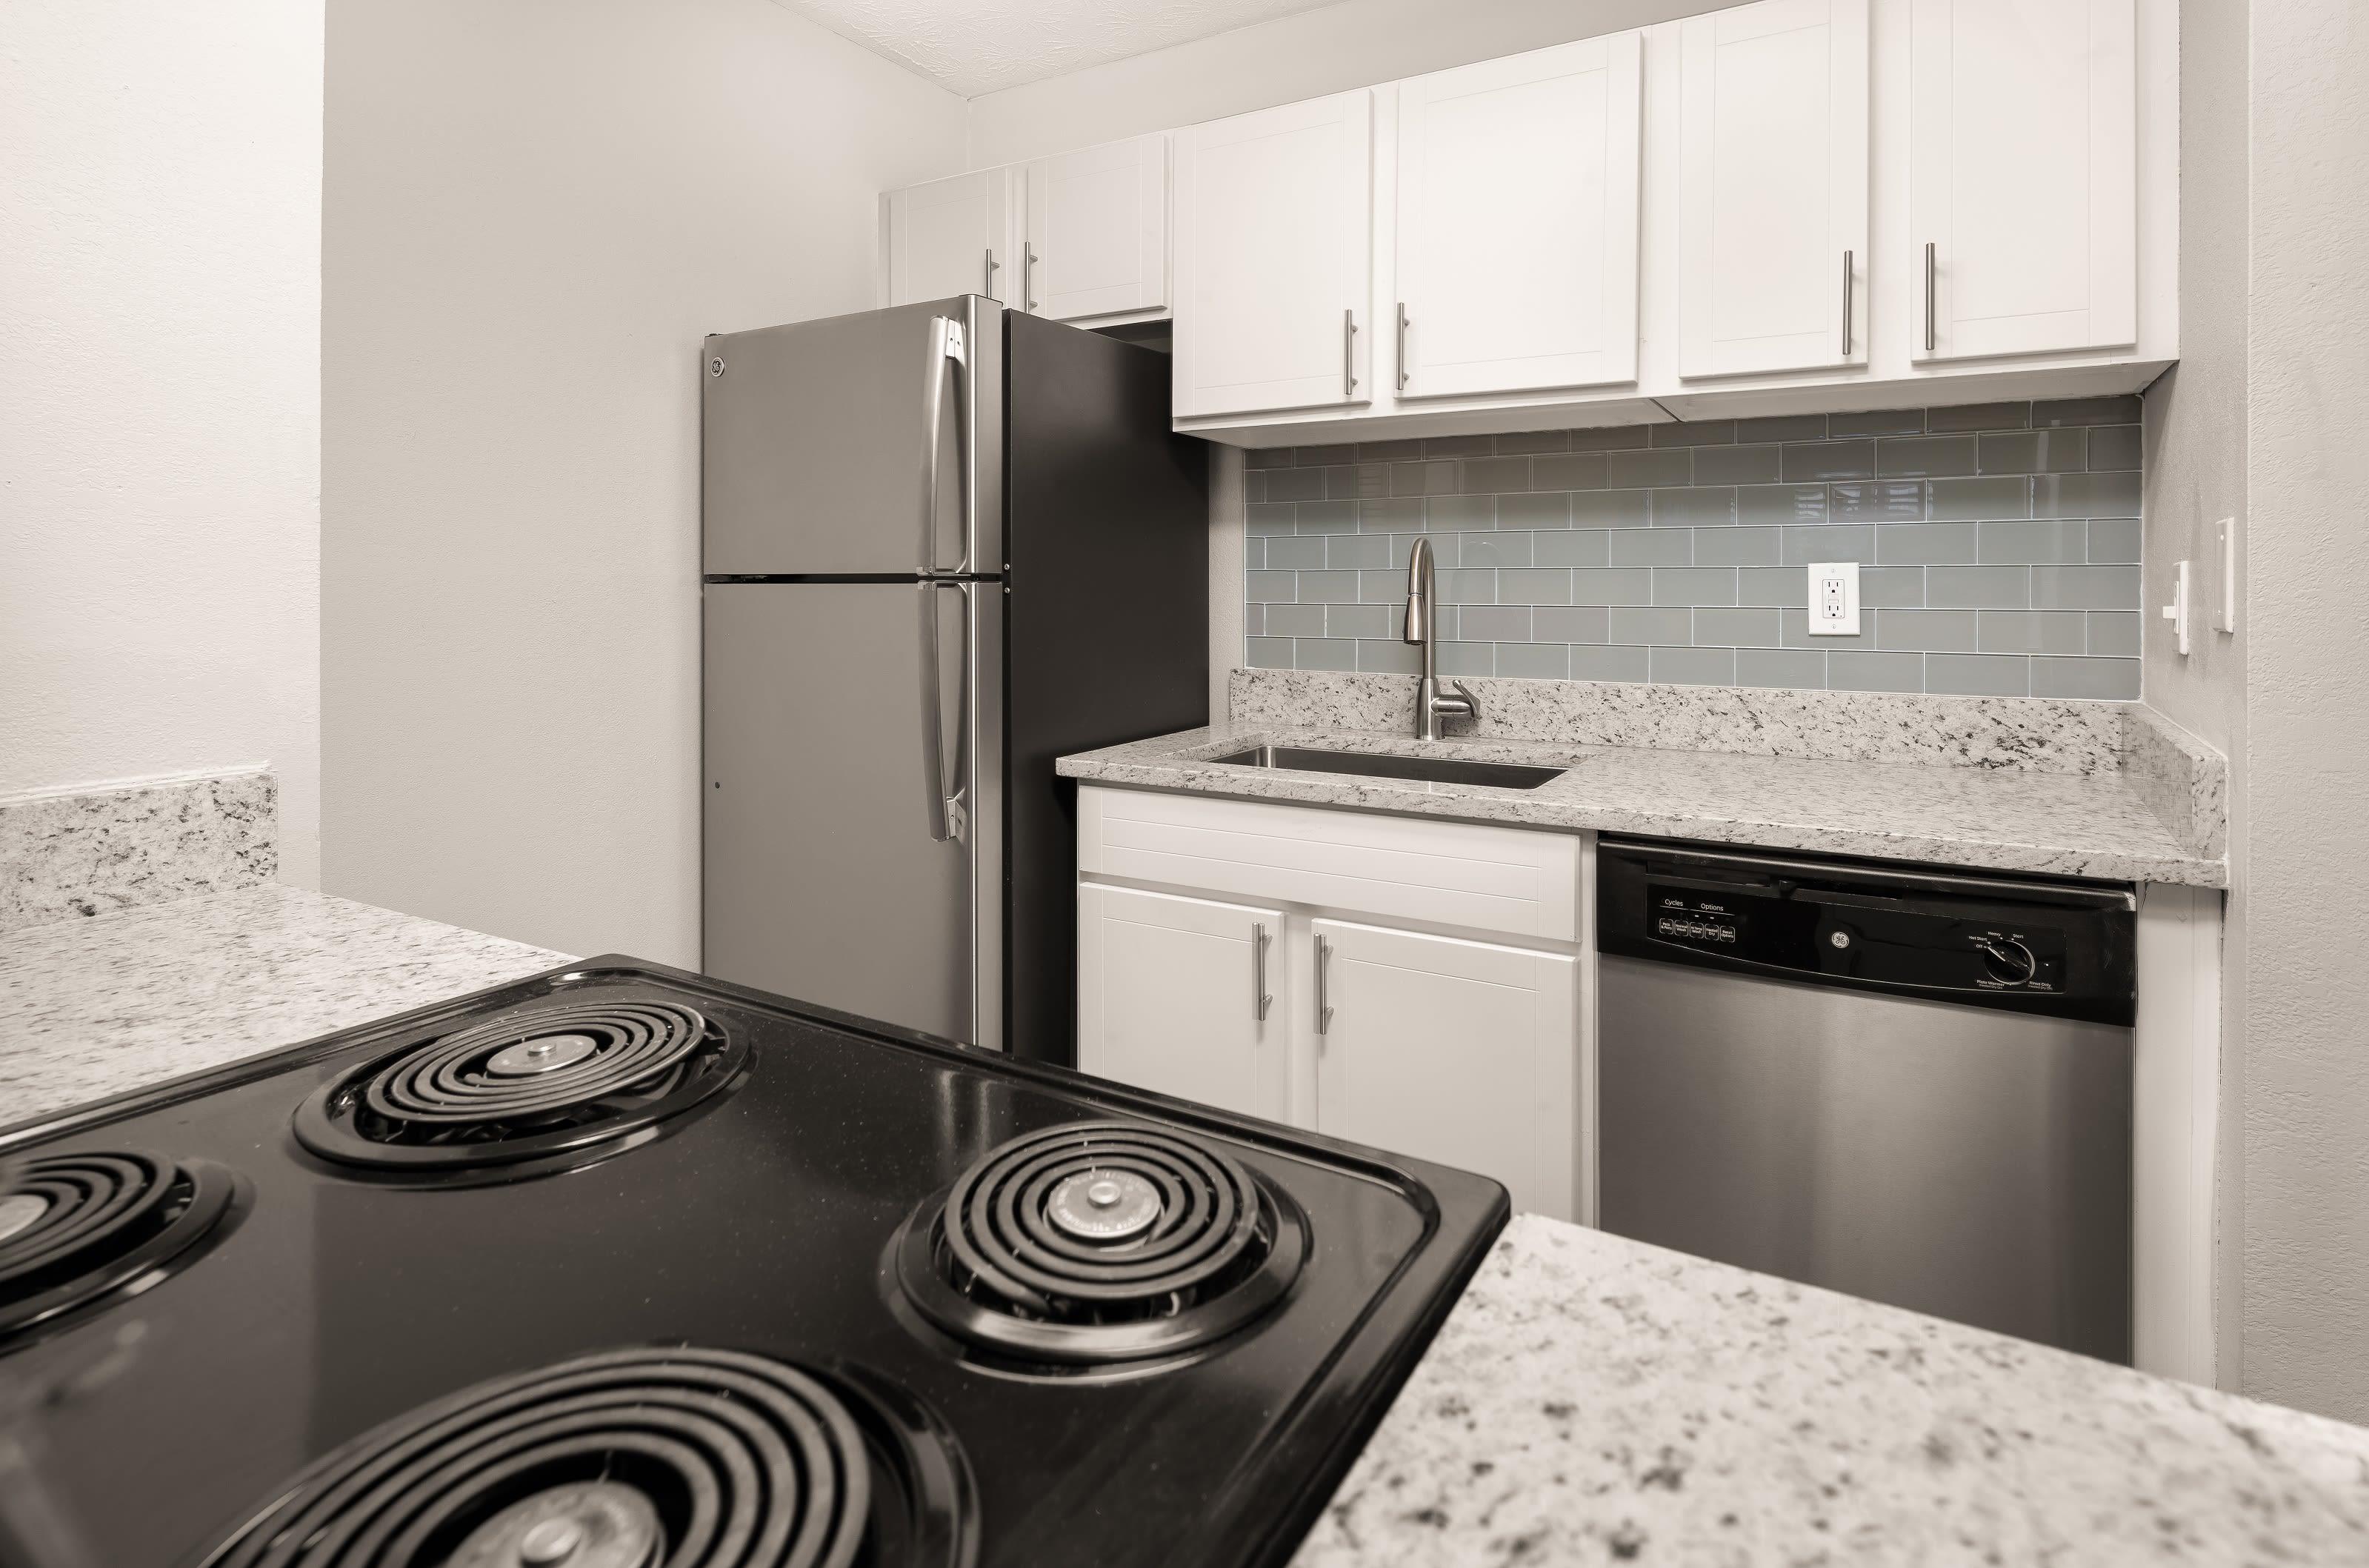 An apartment kitchen at The Franklin in Marietta, GA